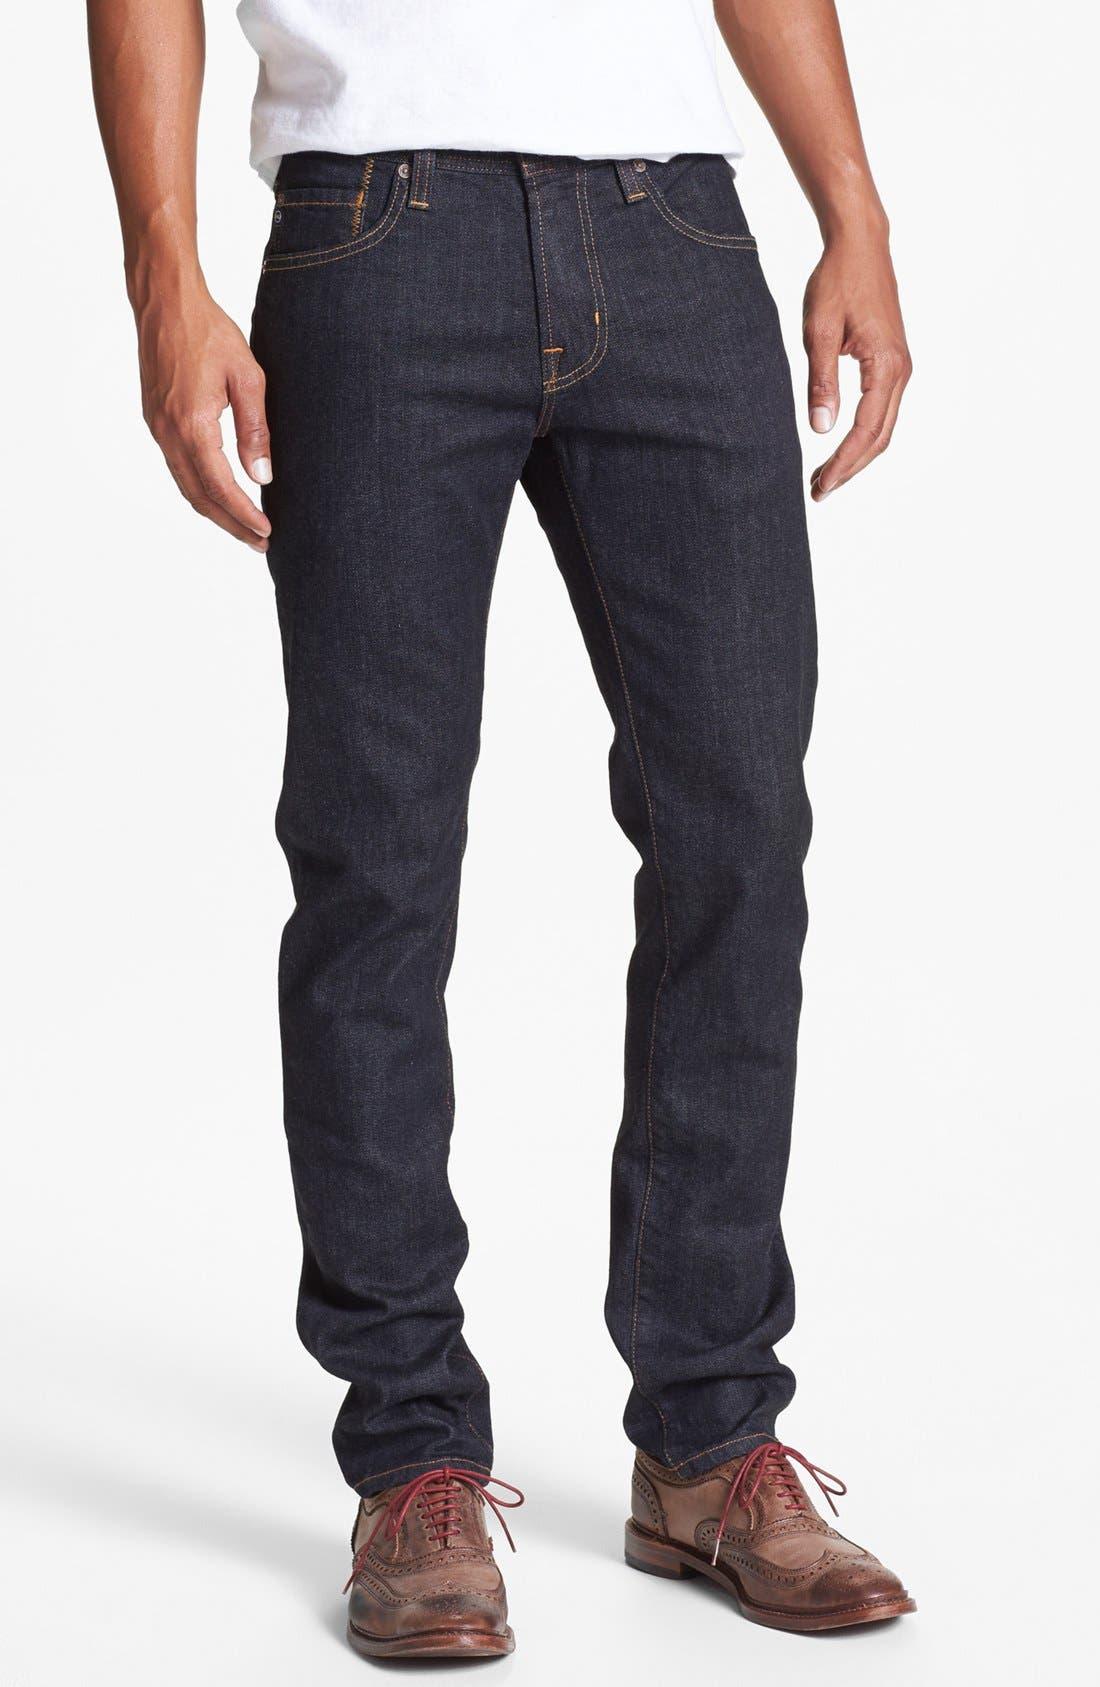 Ag slim fit jeans